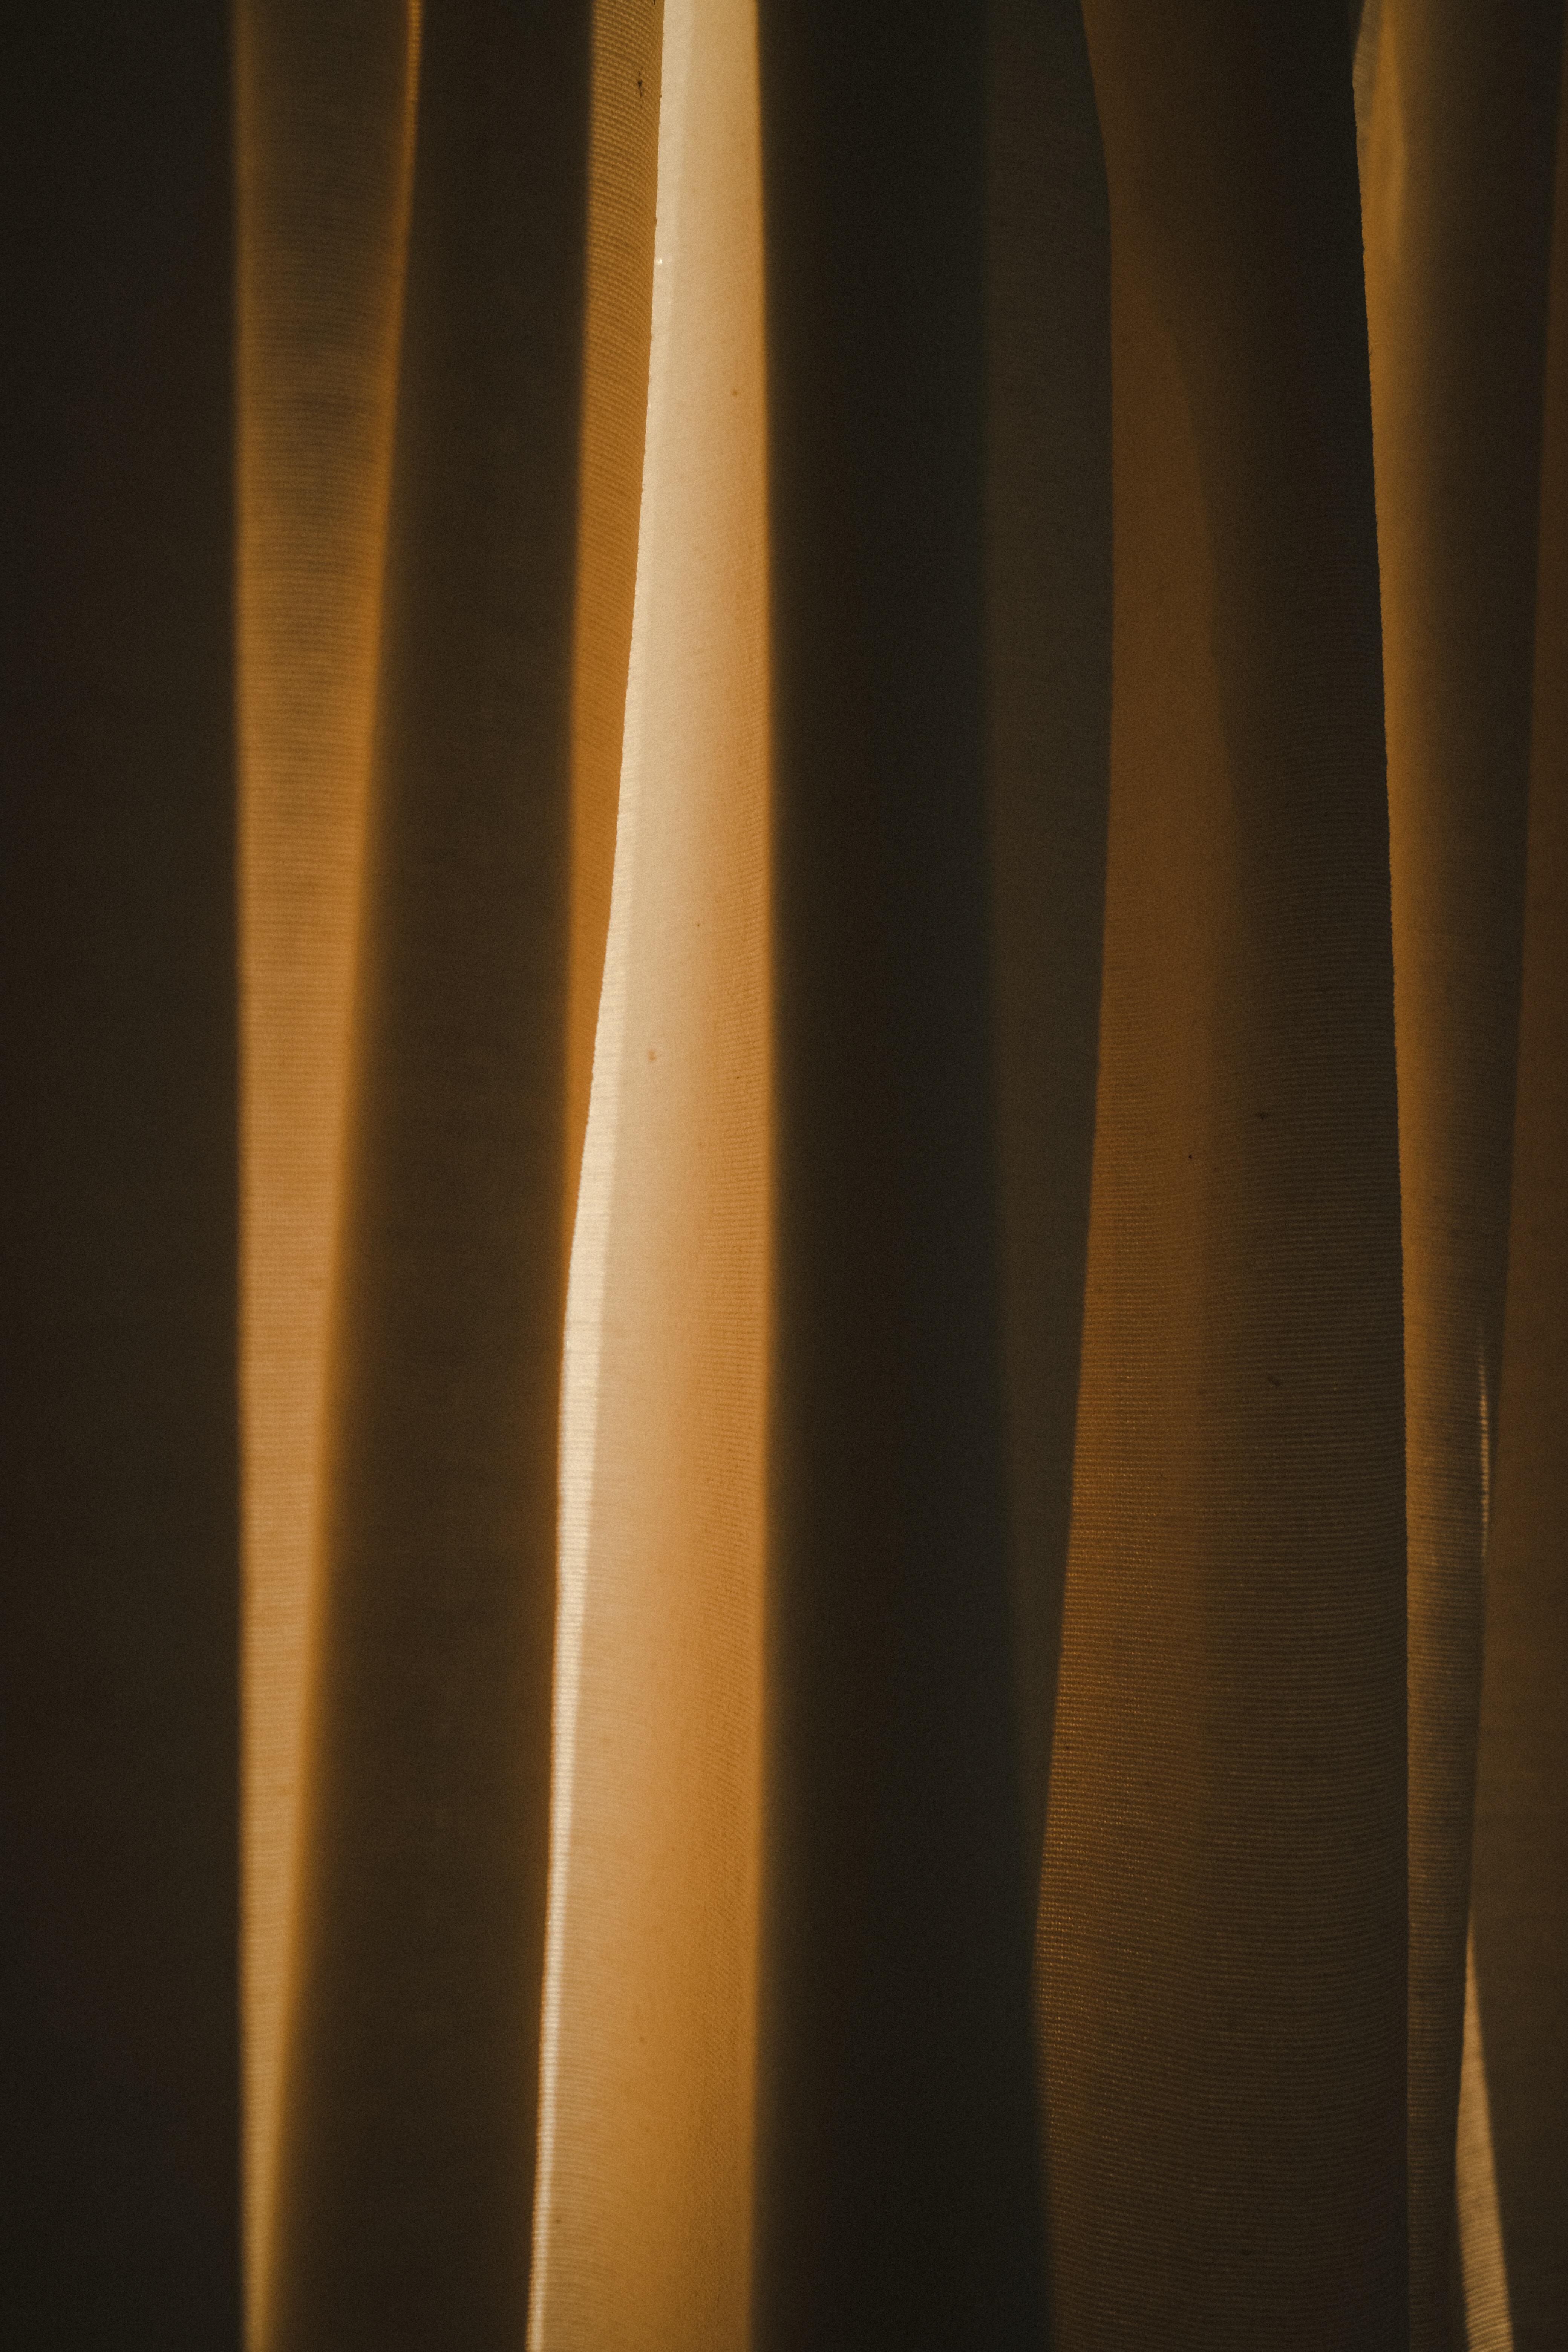 Golden hour light in curtain.